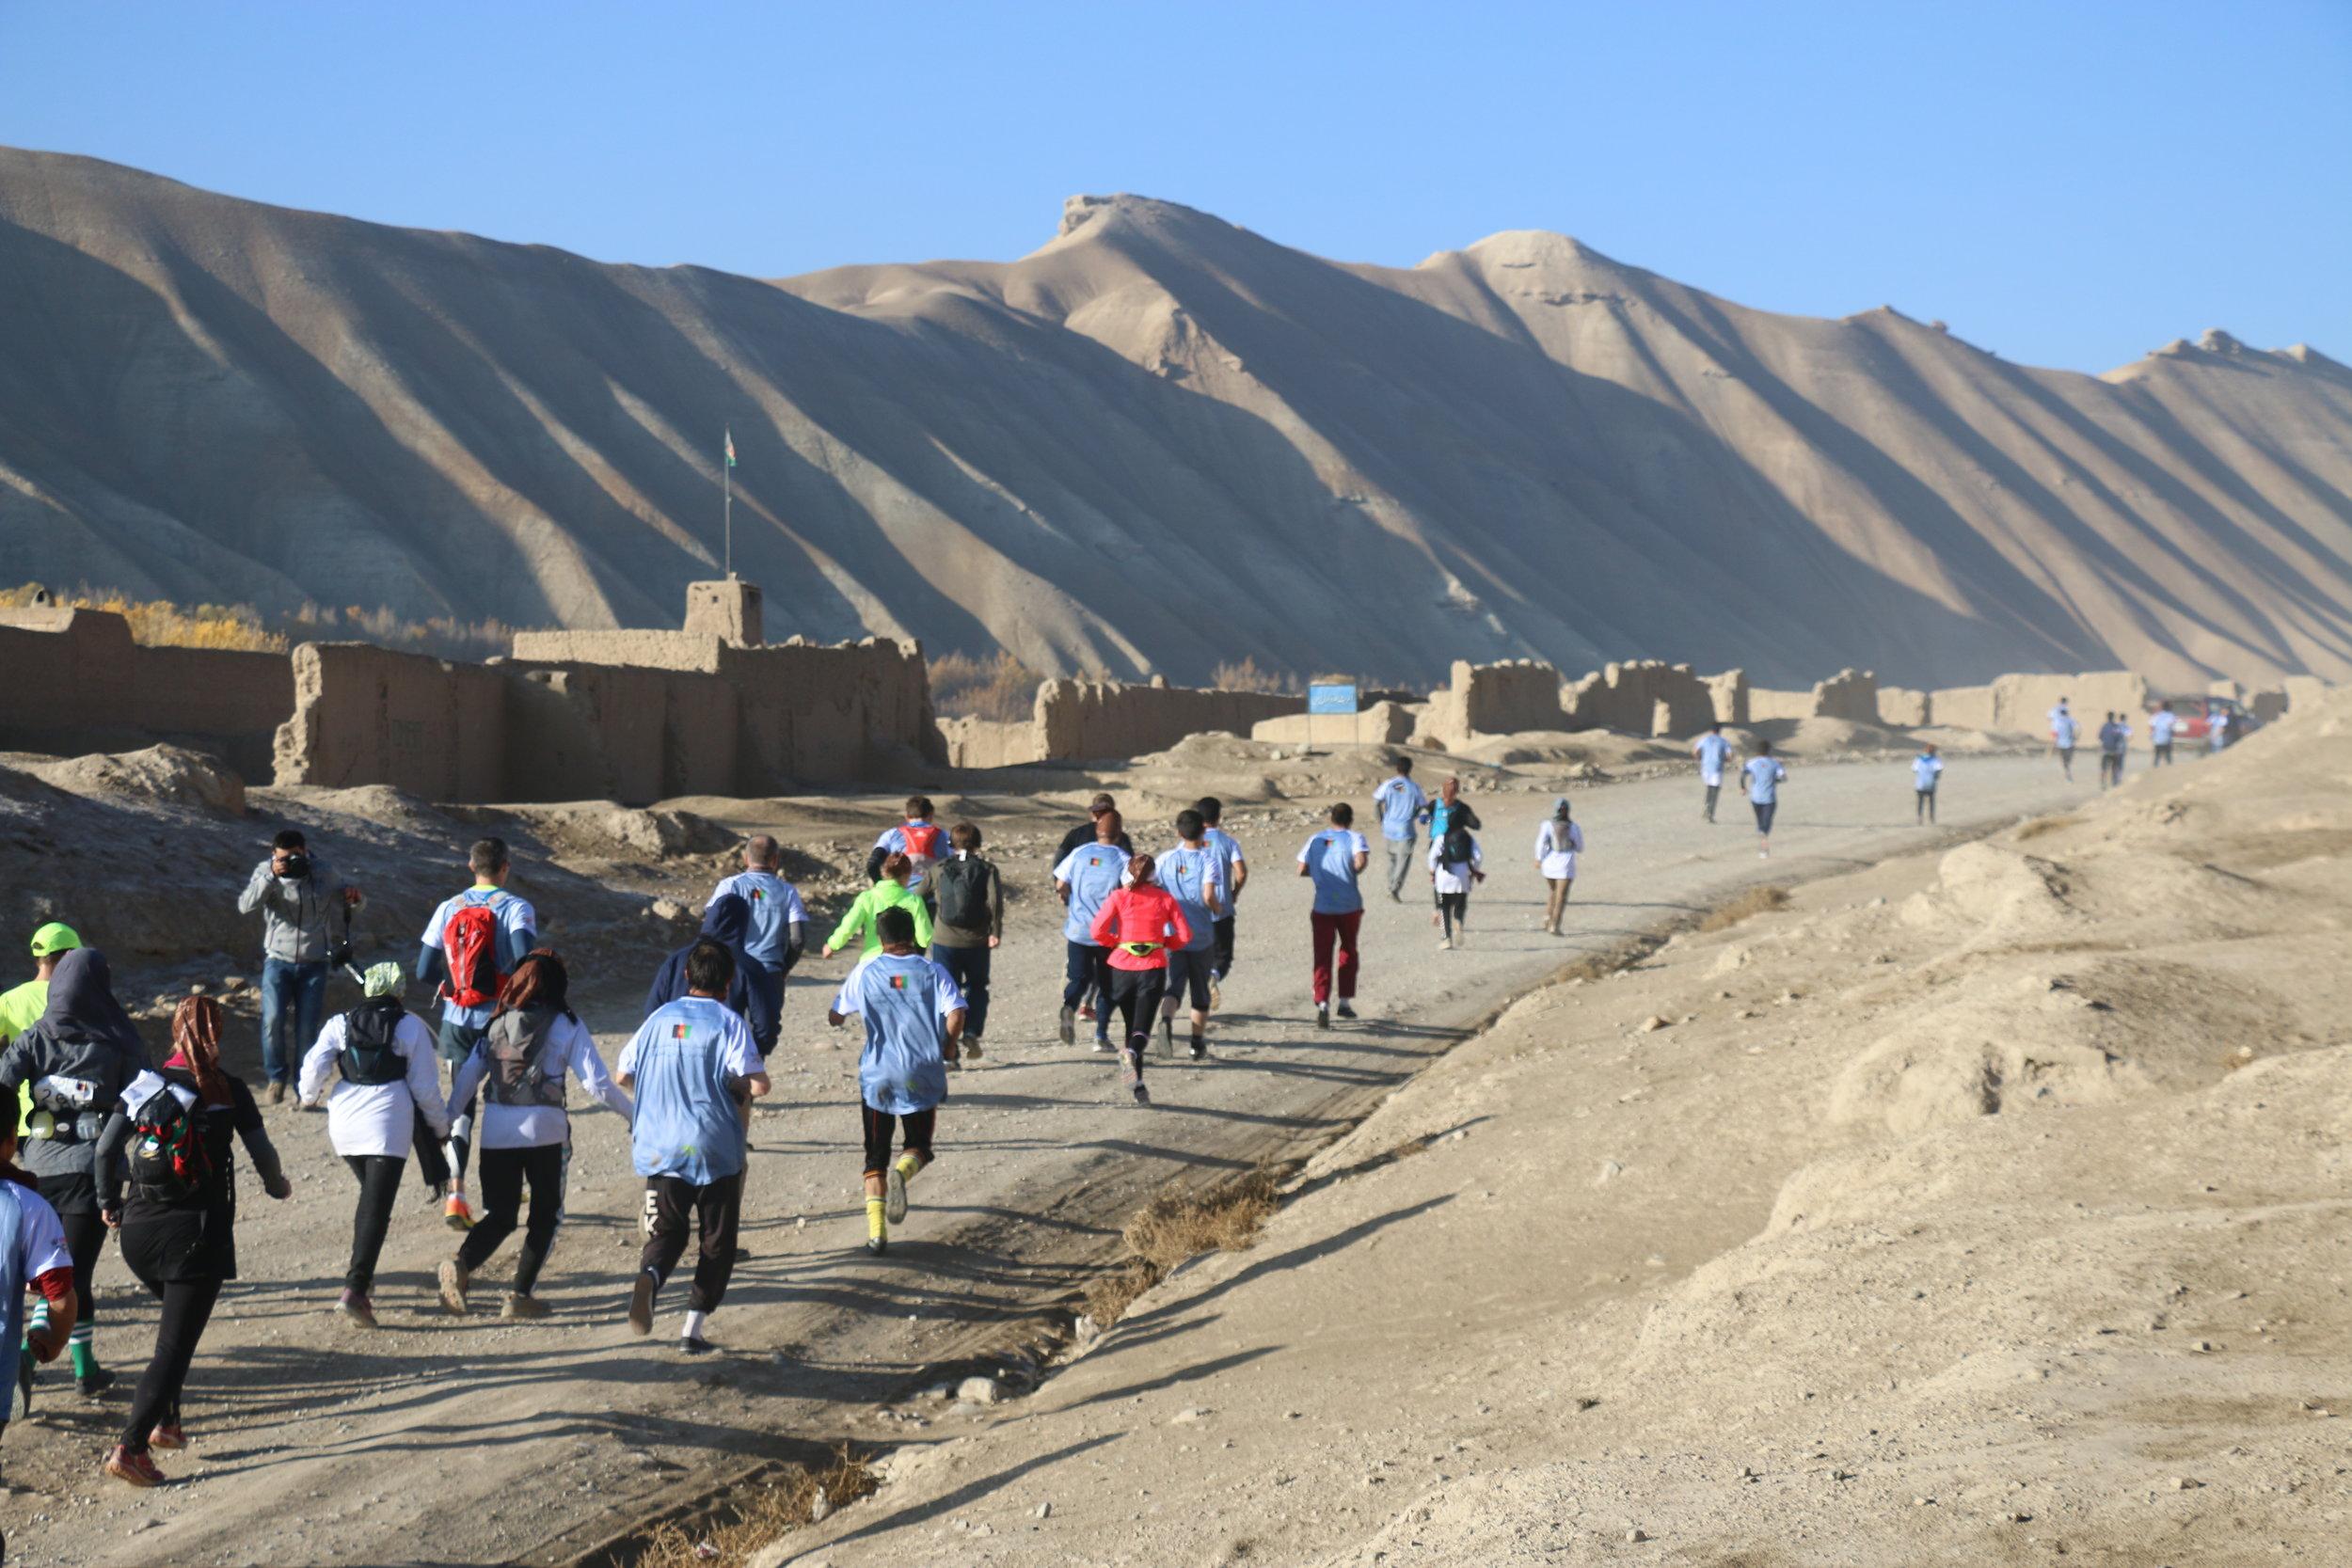 Runners in the 2016 Marathon of Afghanistan. Credit: Latif Azimi